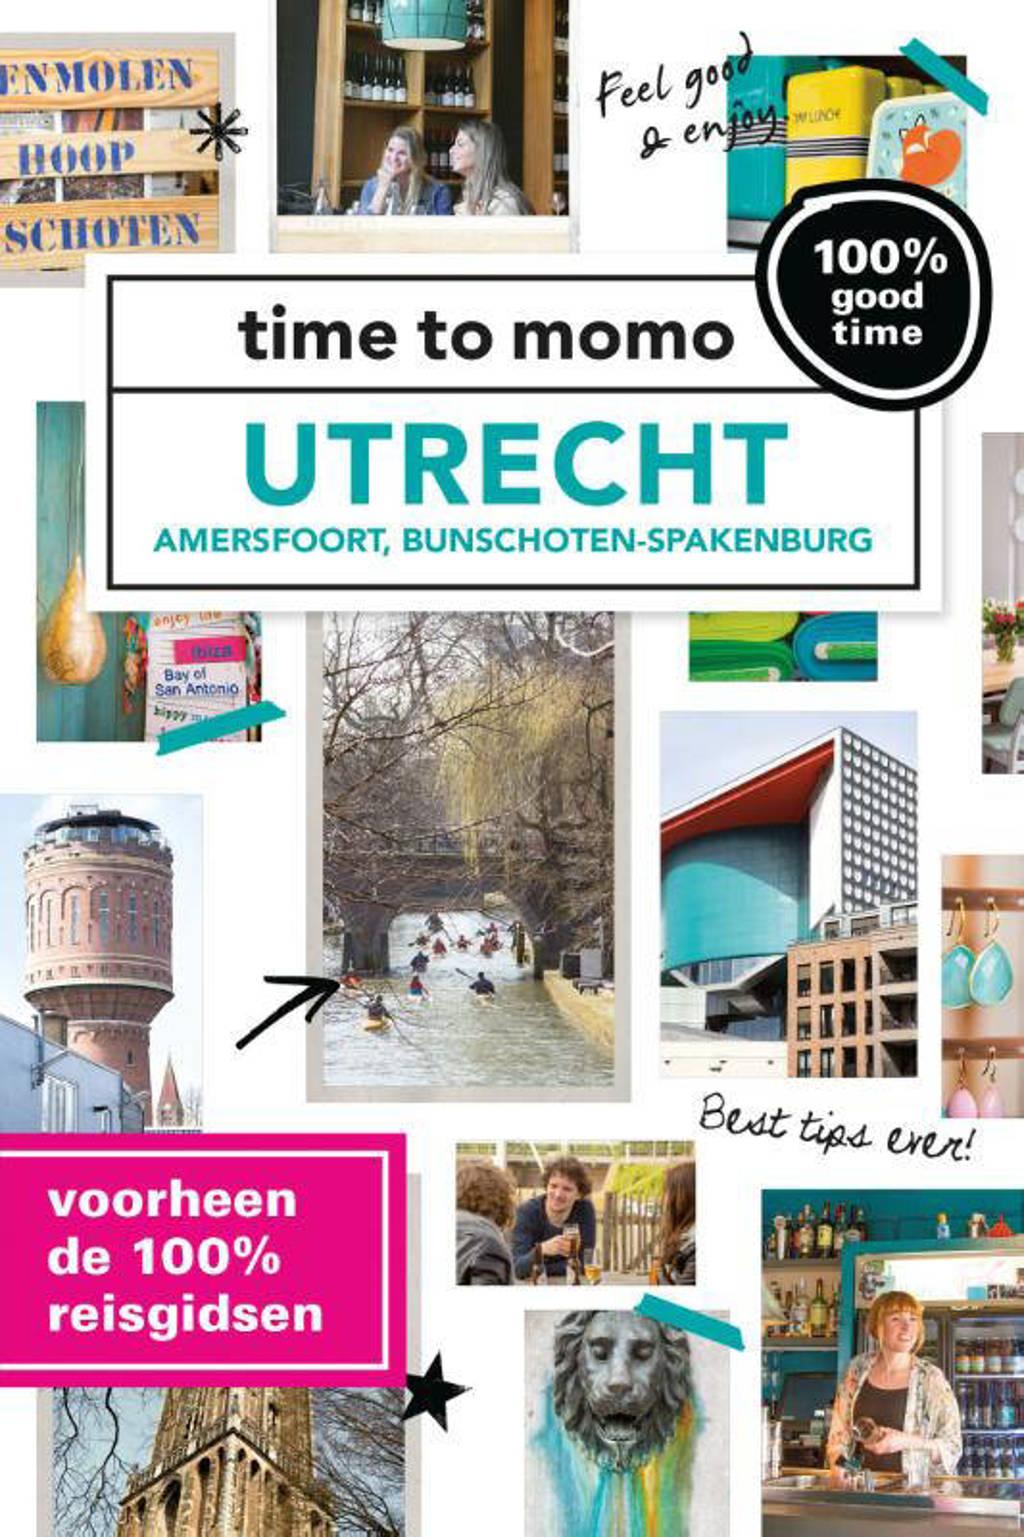 Time to momo: Utrecht - Jette Pellemans